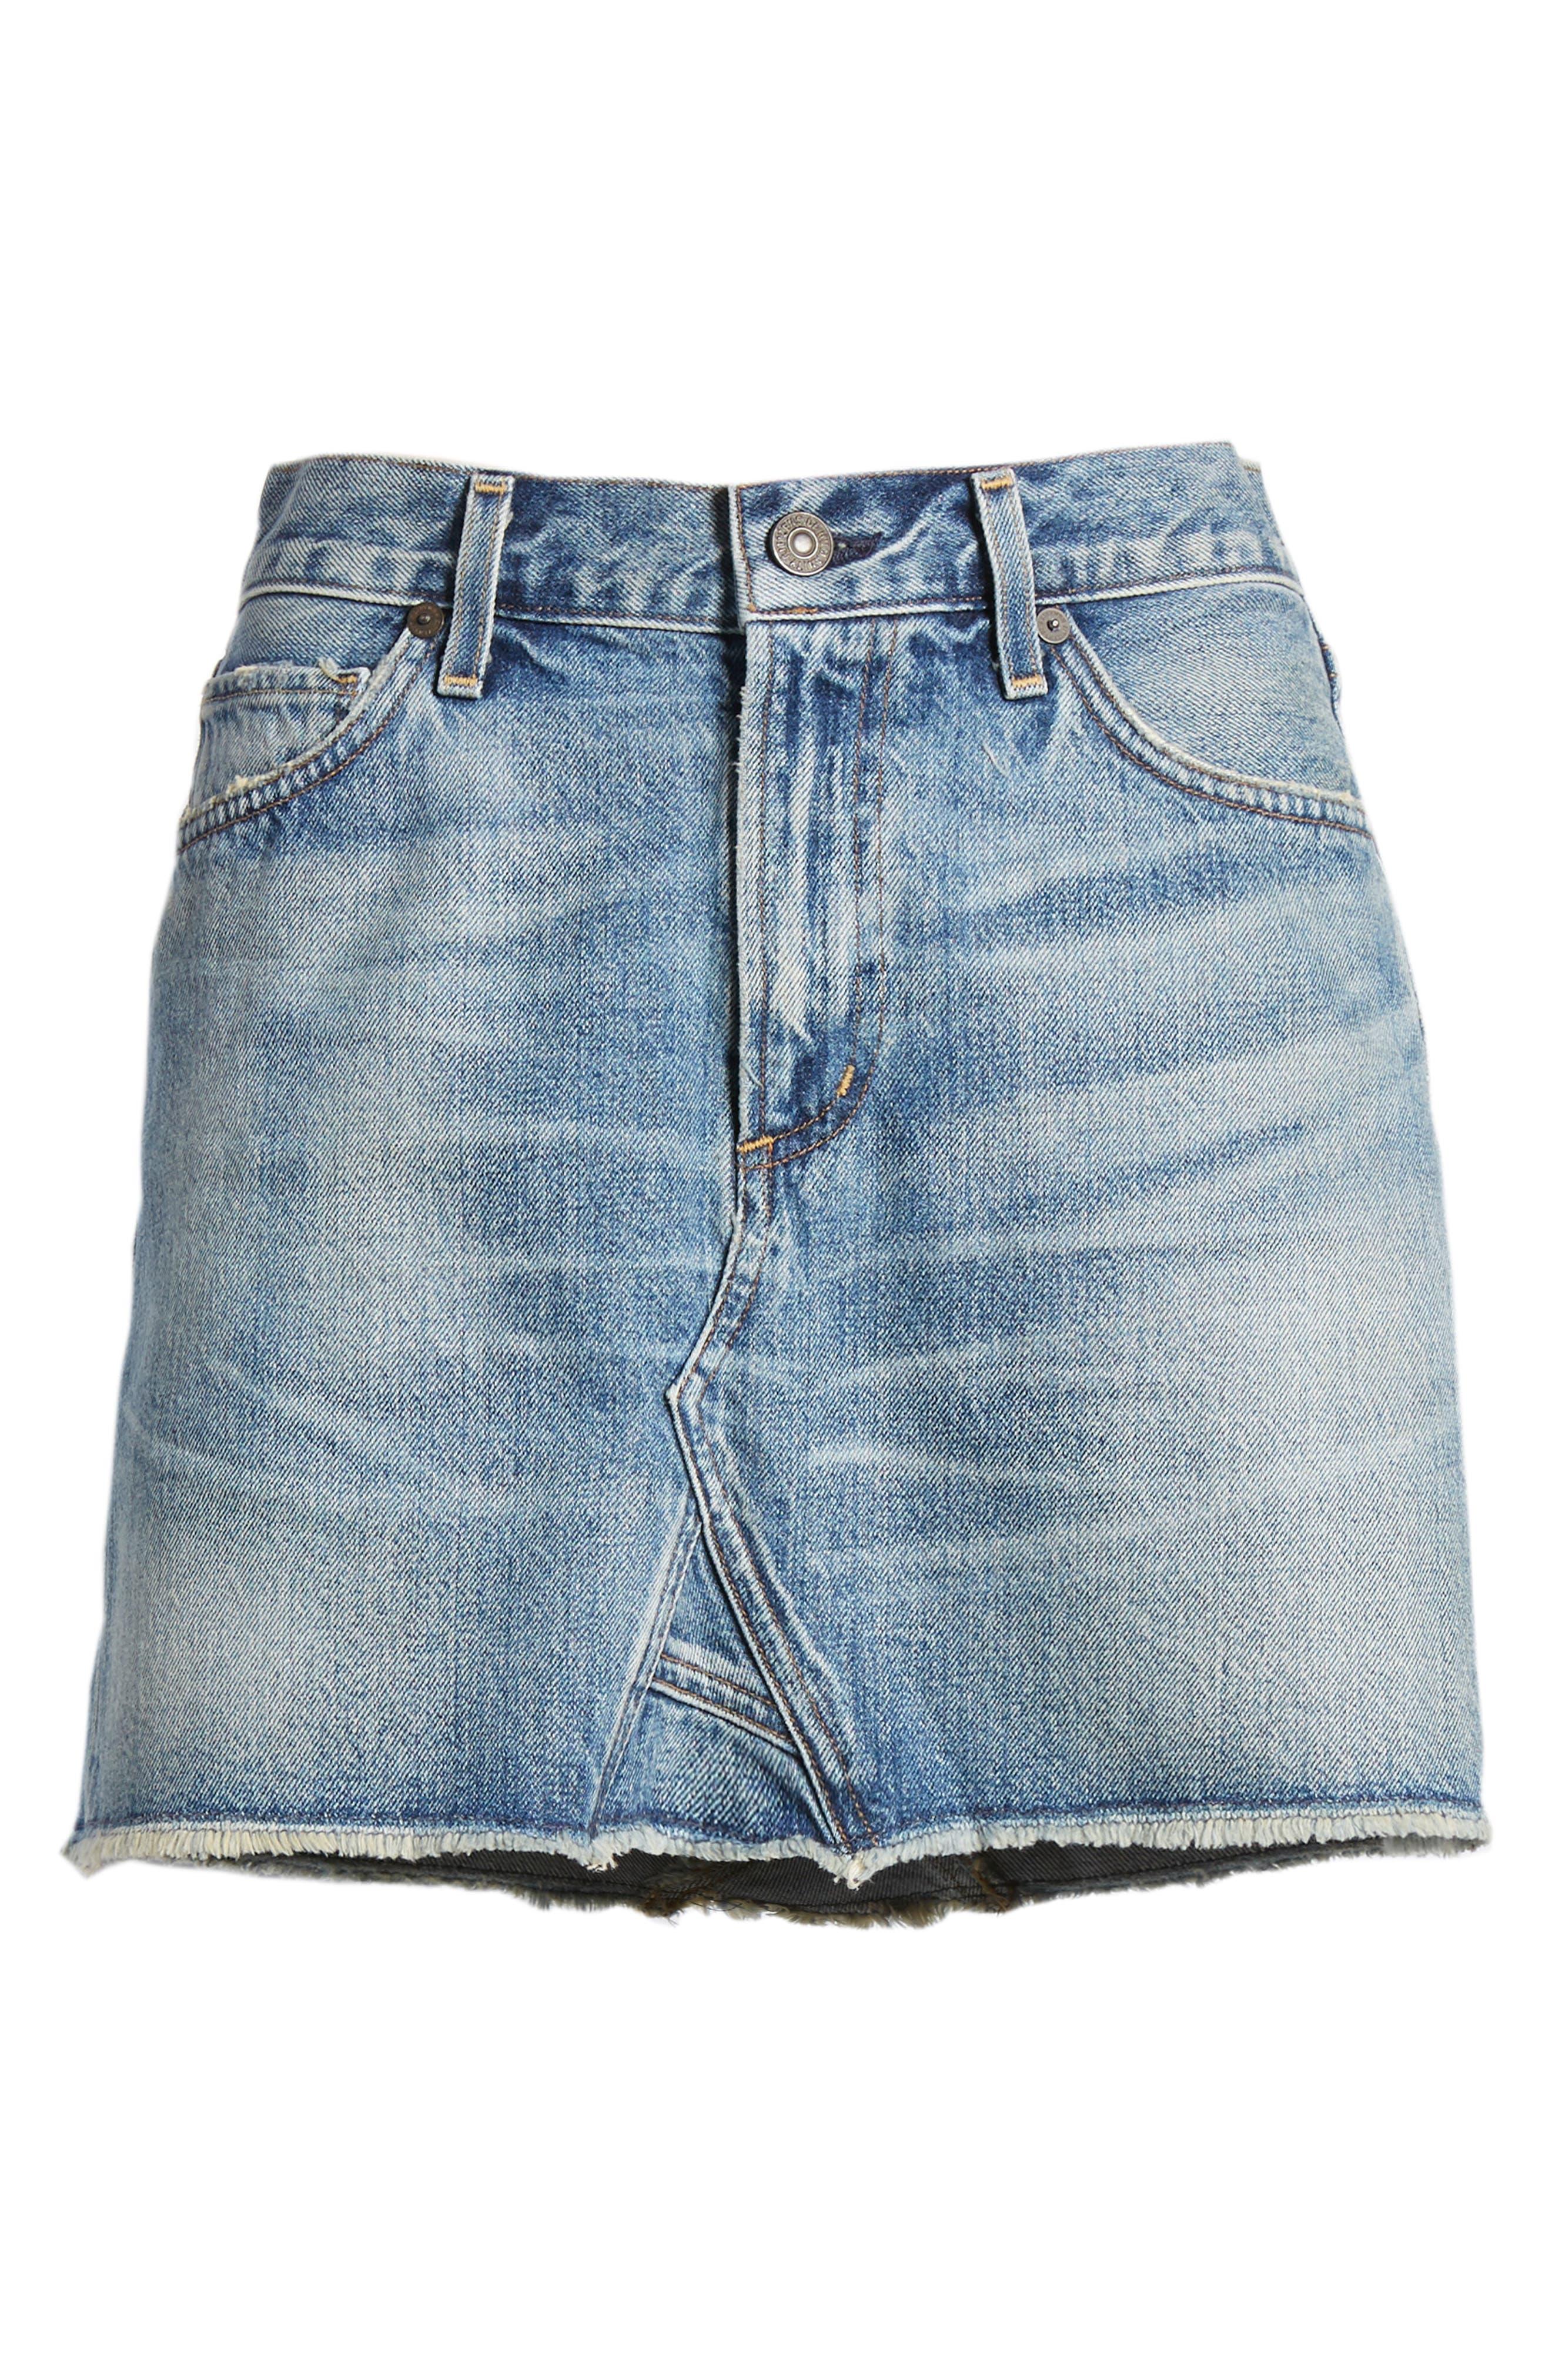 Cutoff Denim Miniskirt,                             Alternate thumbnail 7, color,                             427